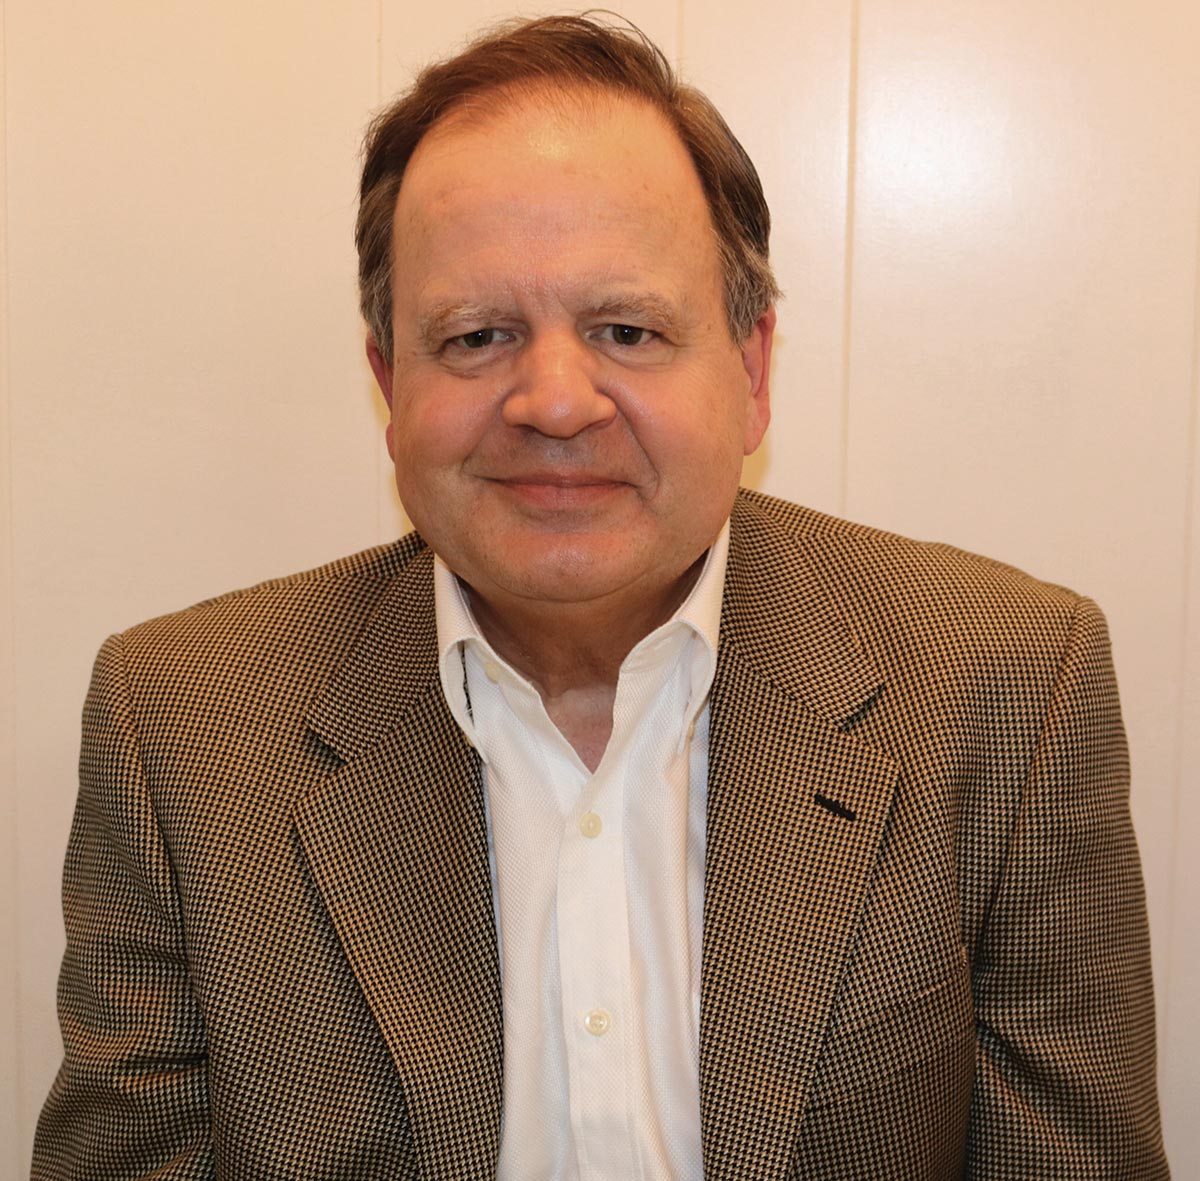 RIHA Names Burkhardt as Business Development Manager